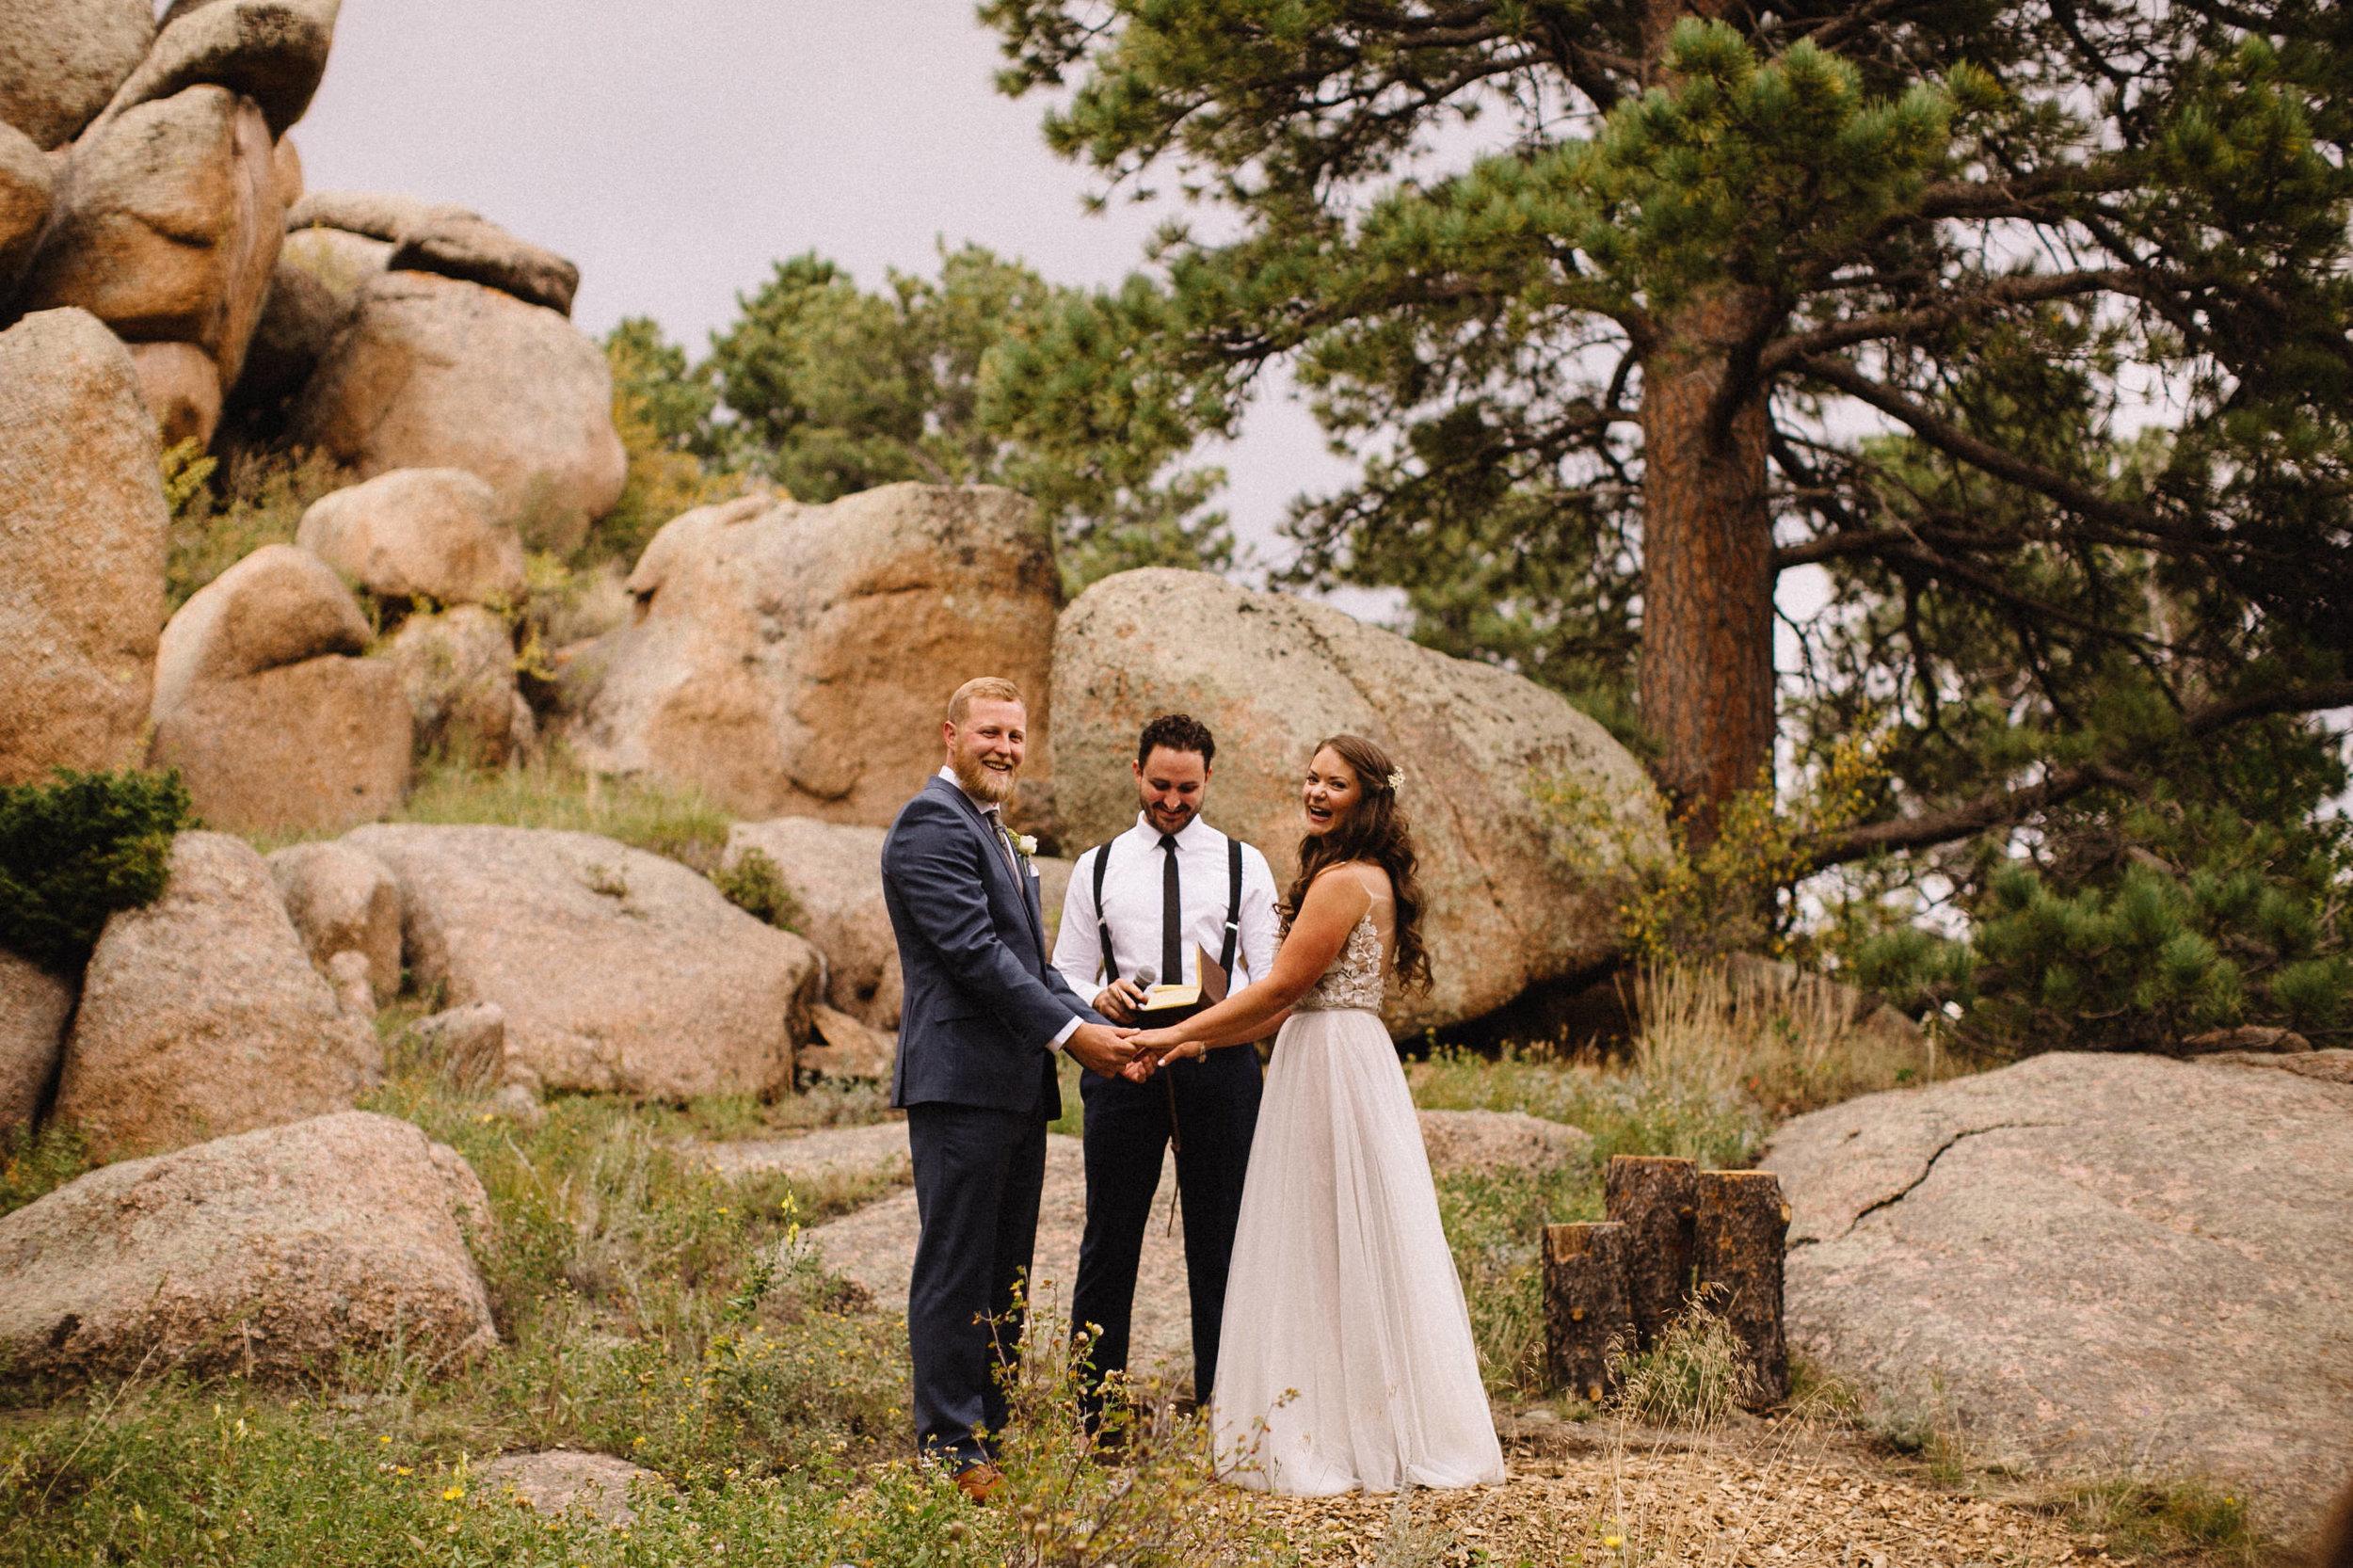 Liz Osban Photography Vedauwoo Buford Wyoming Happy Jack Wedding Elopement Destination Small Forest Cheyenne Laramie Medicine Bow National Forest Ceremony Sarah Taylor3.jpg